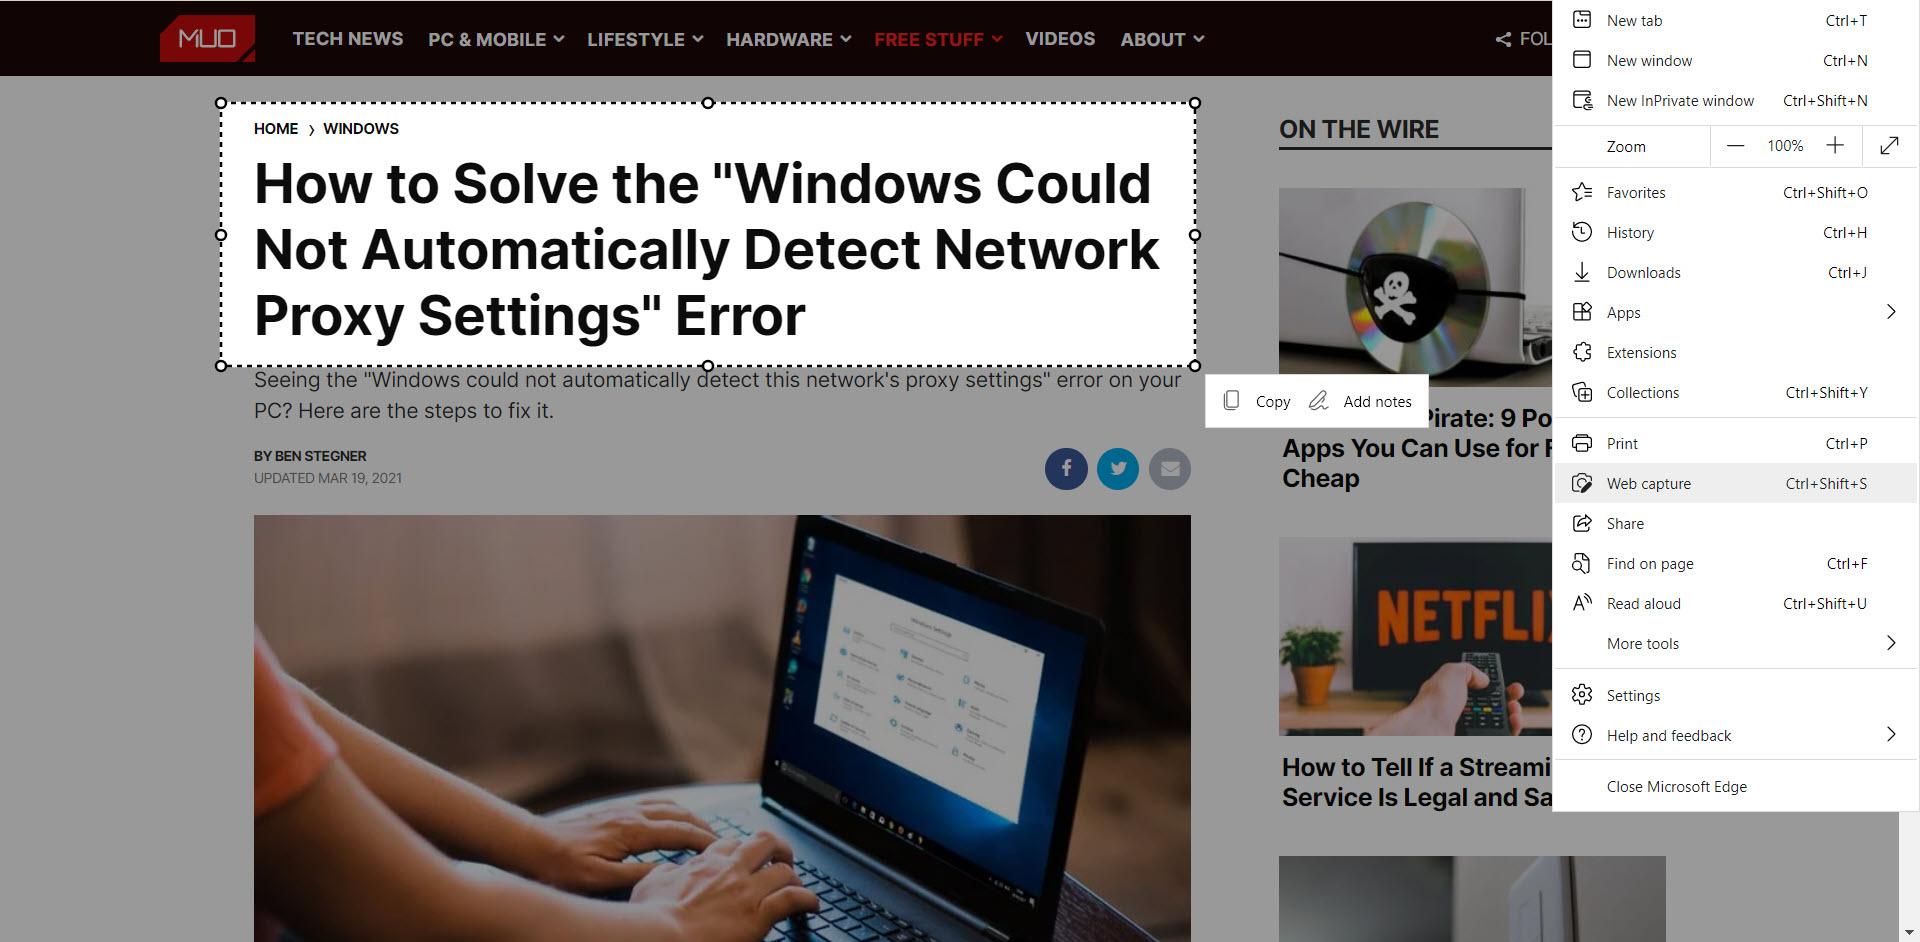 Microsoft Edge Web Capture Feature